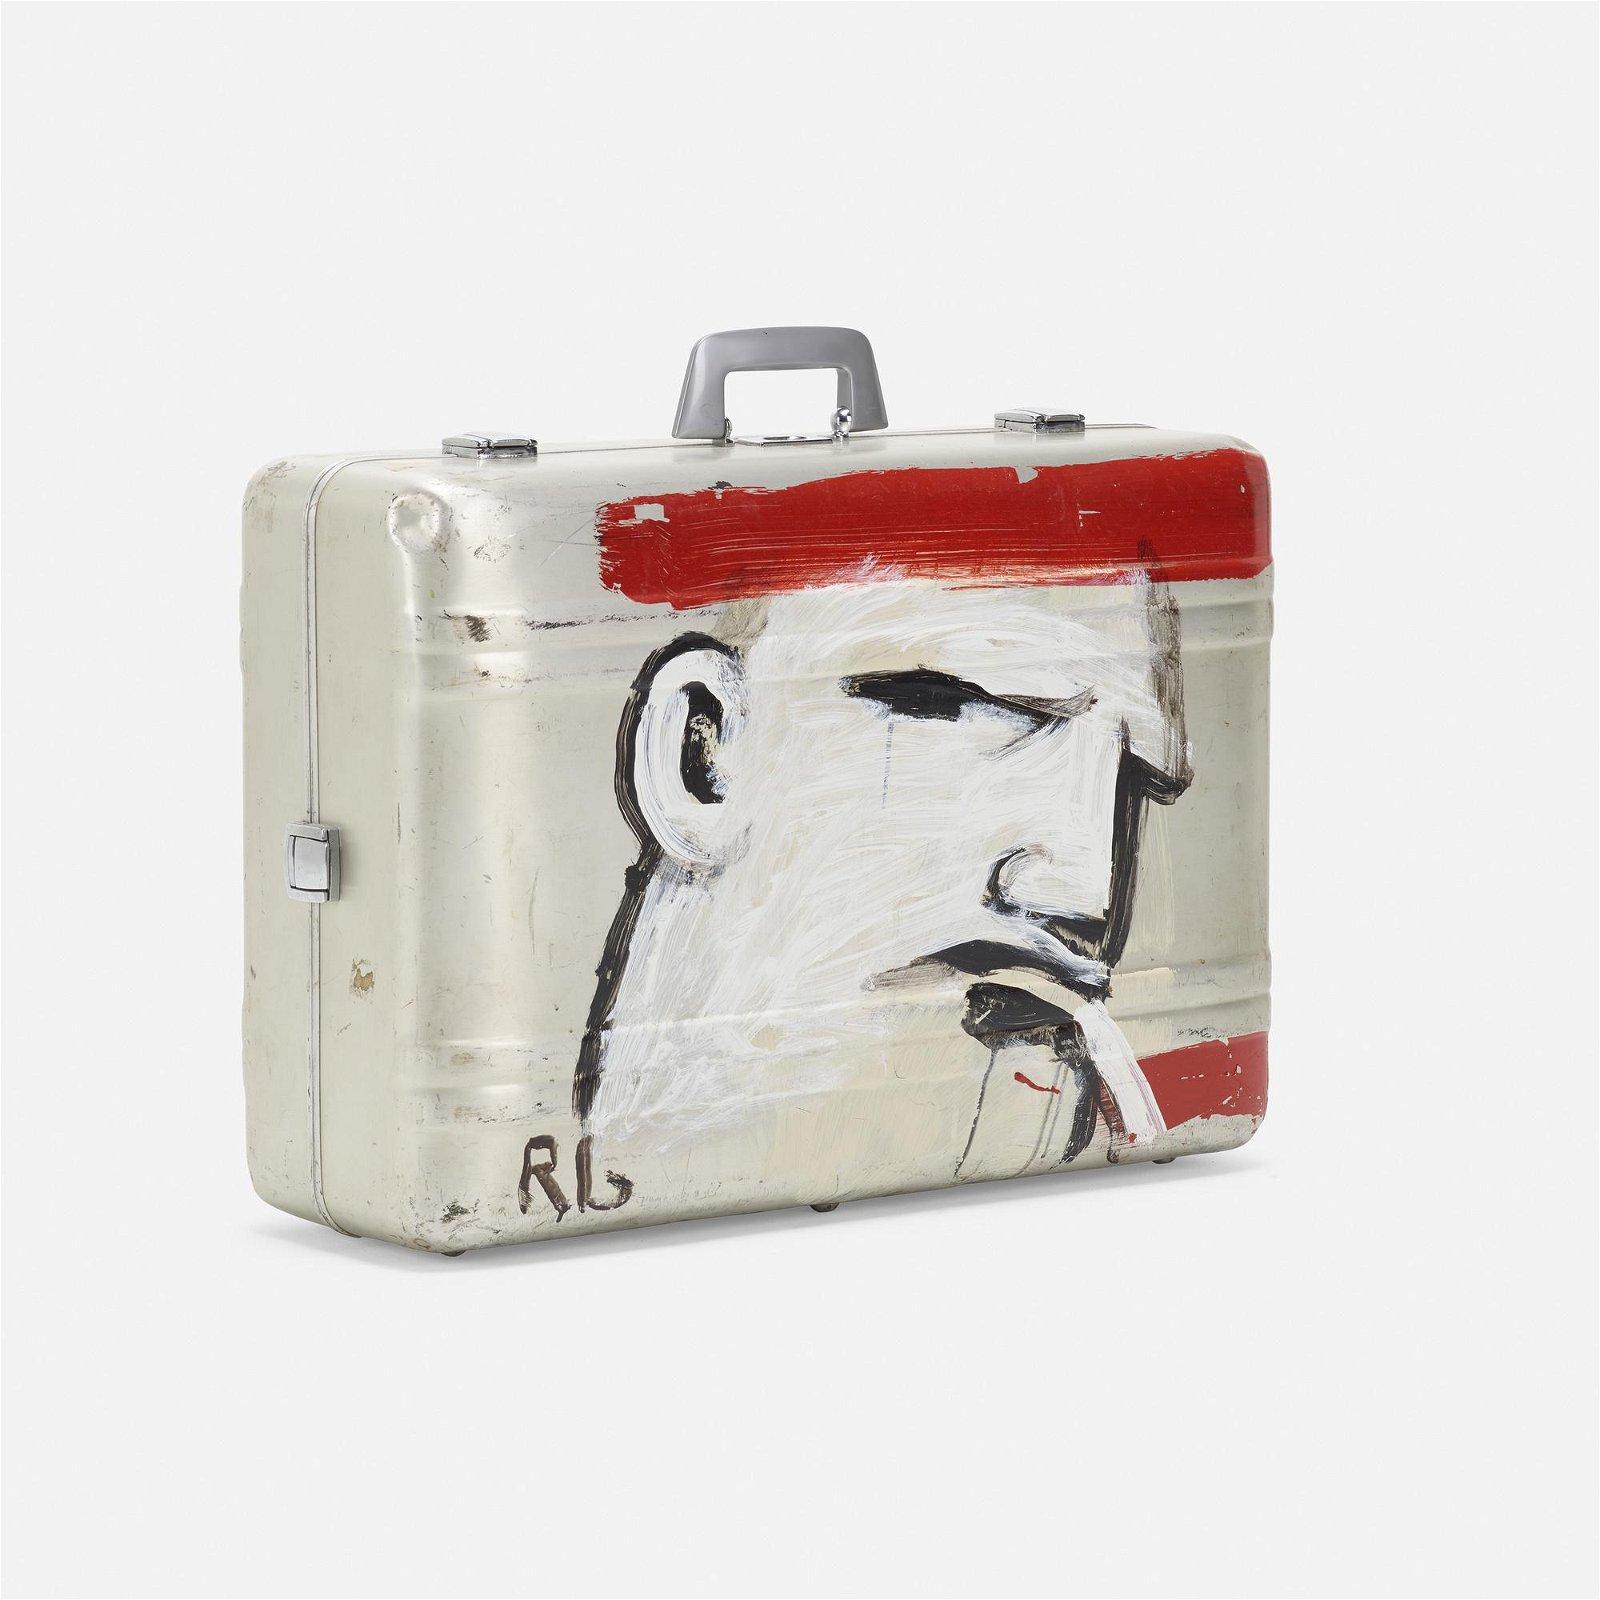 Robert Loughlin, Untitled (Briefcase)